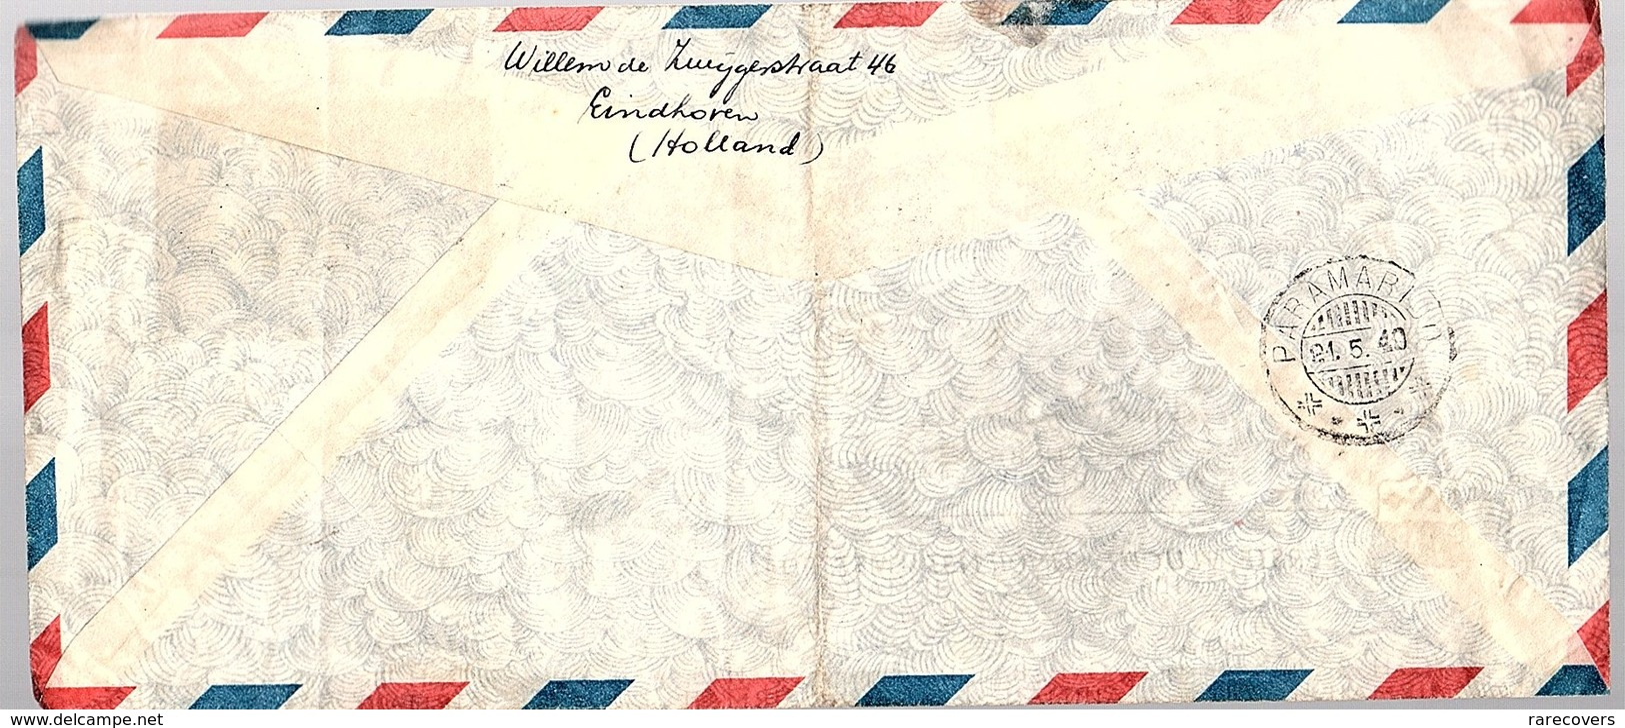 1949 1st Flight Amsterdam > Paramaribo (LA20-6) - Suriname ... - 1975